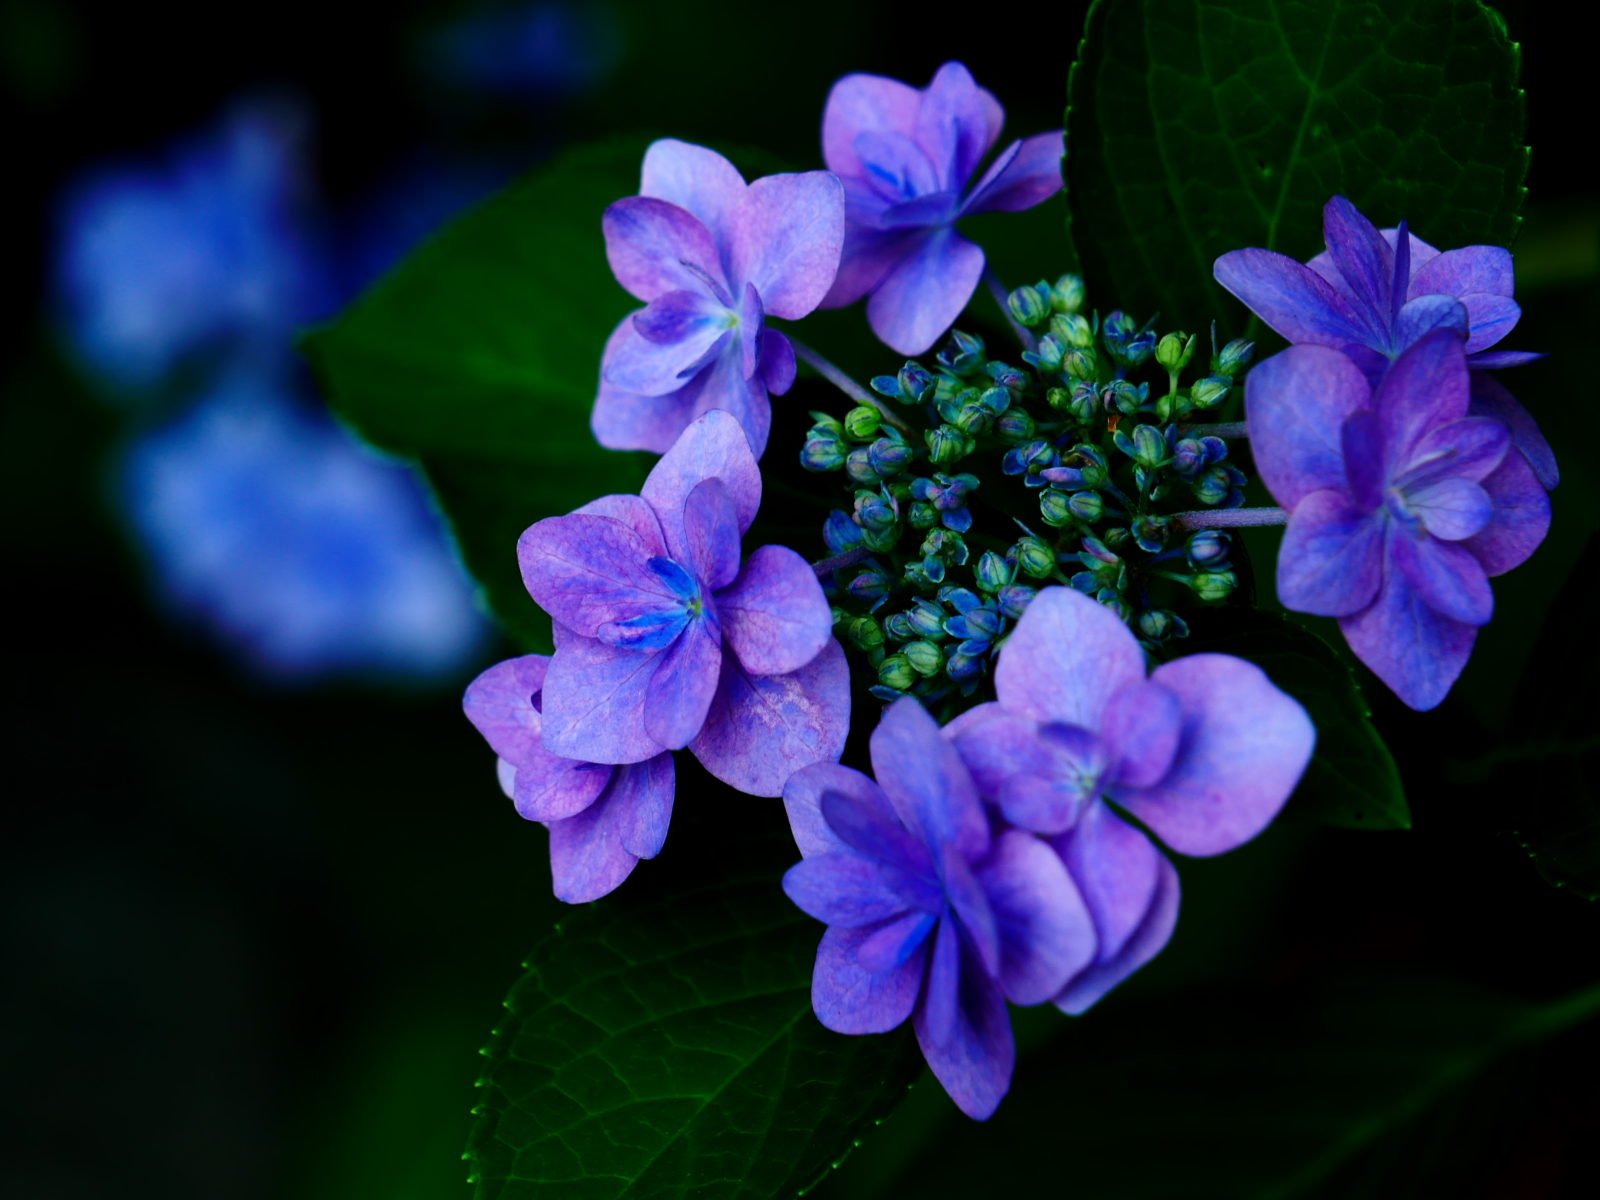 LEICA 12-60mm | 作例 | 紫陽花の雅